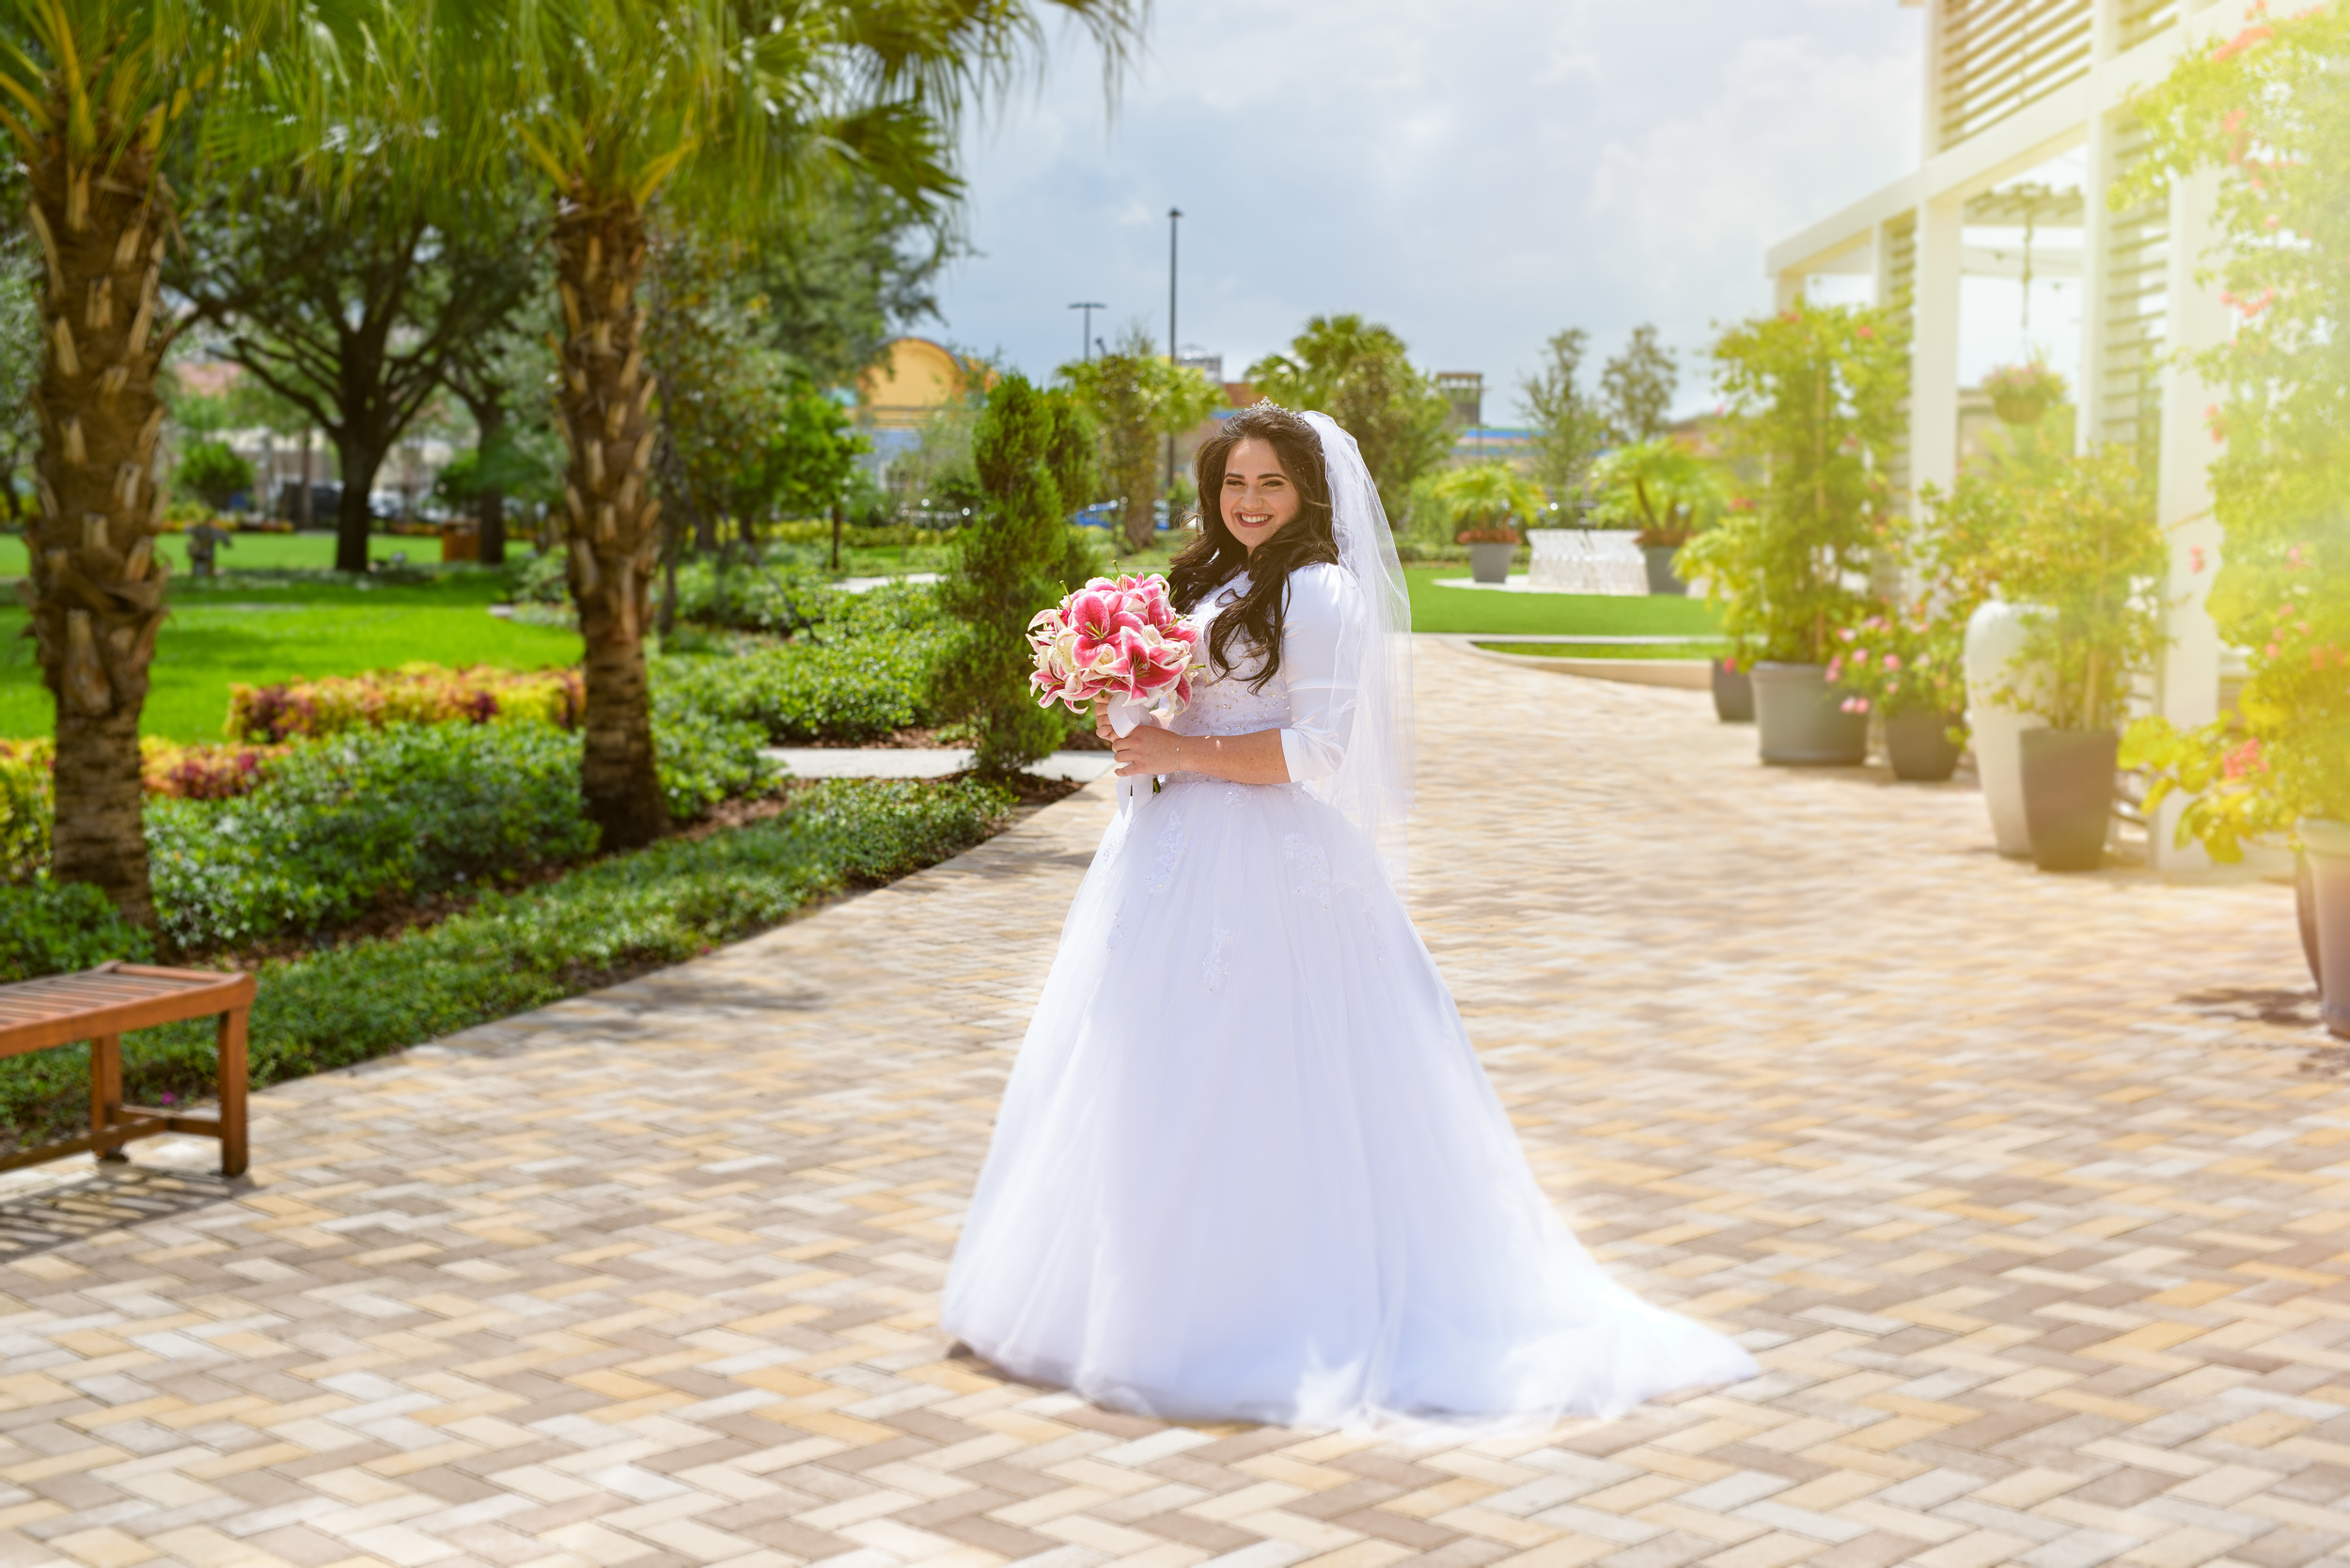 Wedding by Levikfoto.com-014.jpg